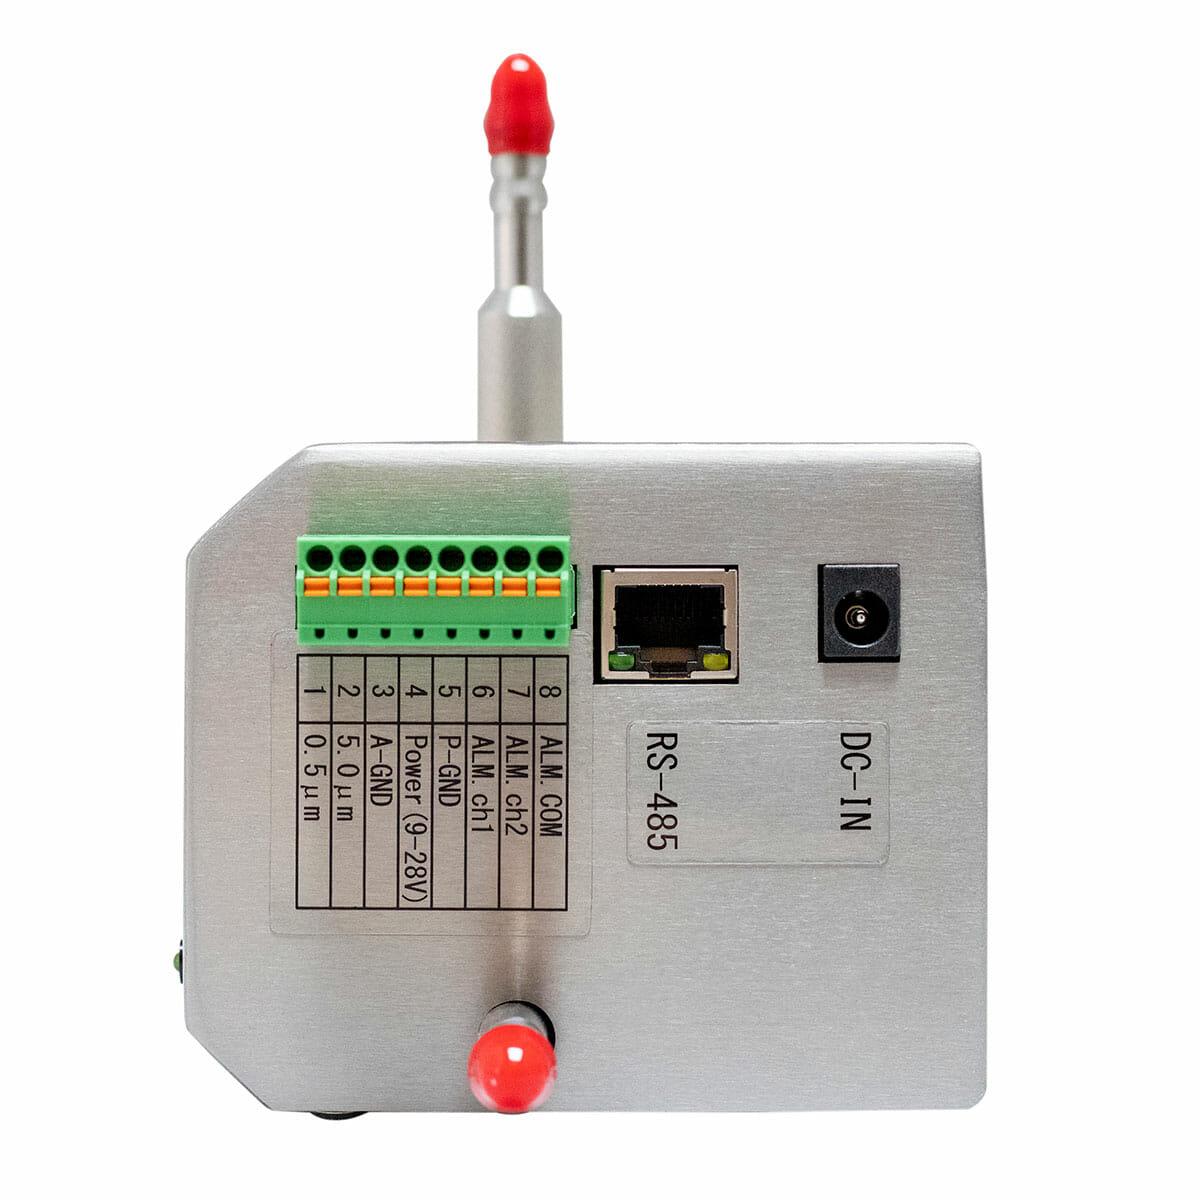 Kanomax Remote Particle Sensor - Model 3719-A - Side View